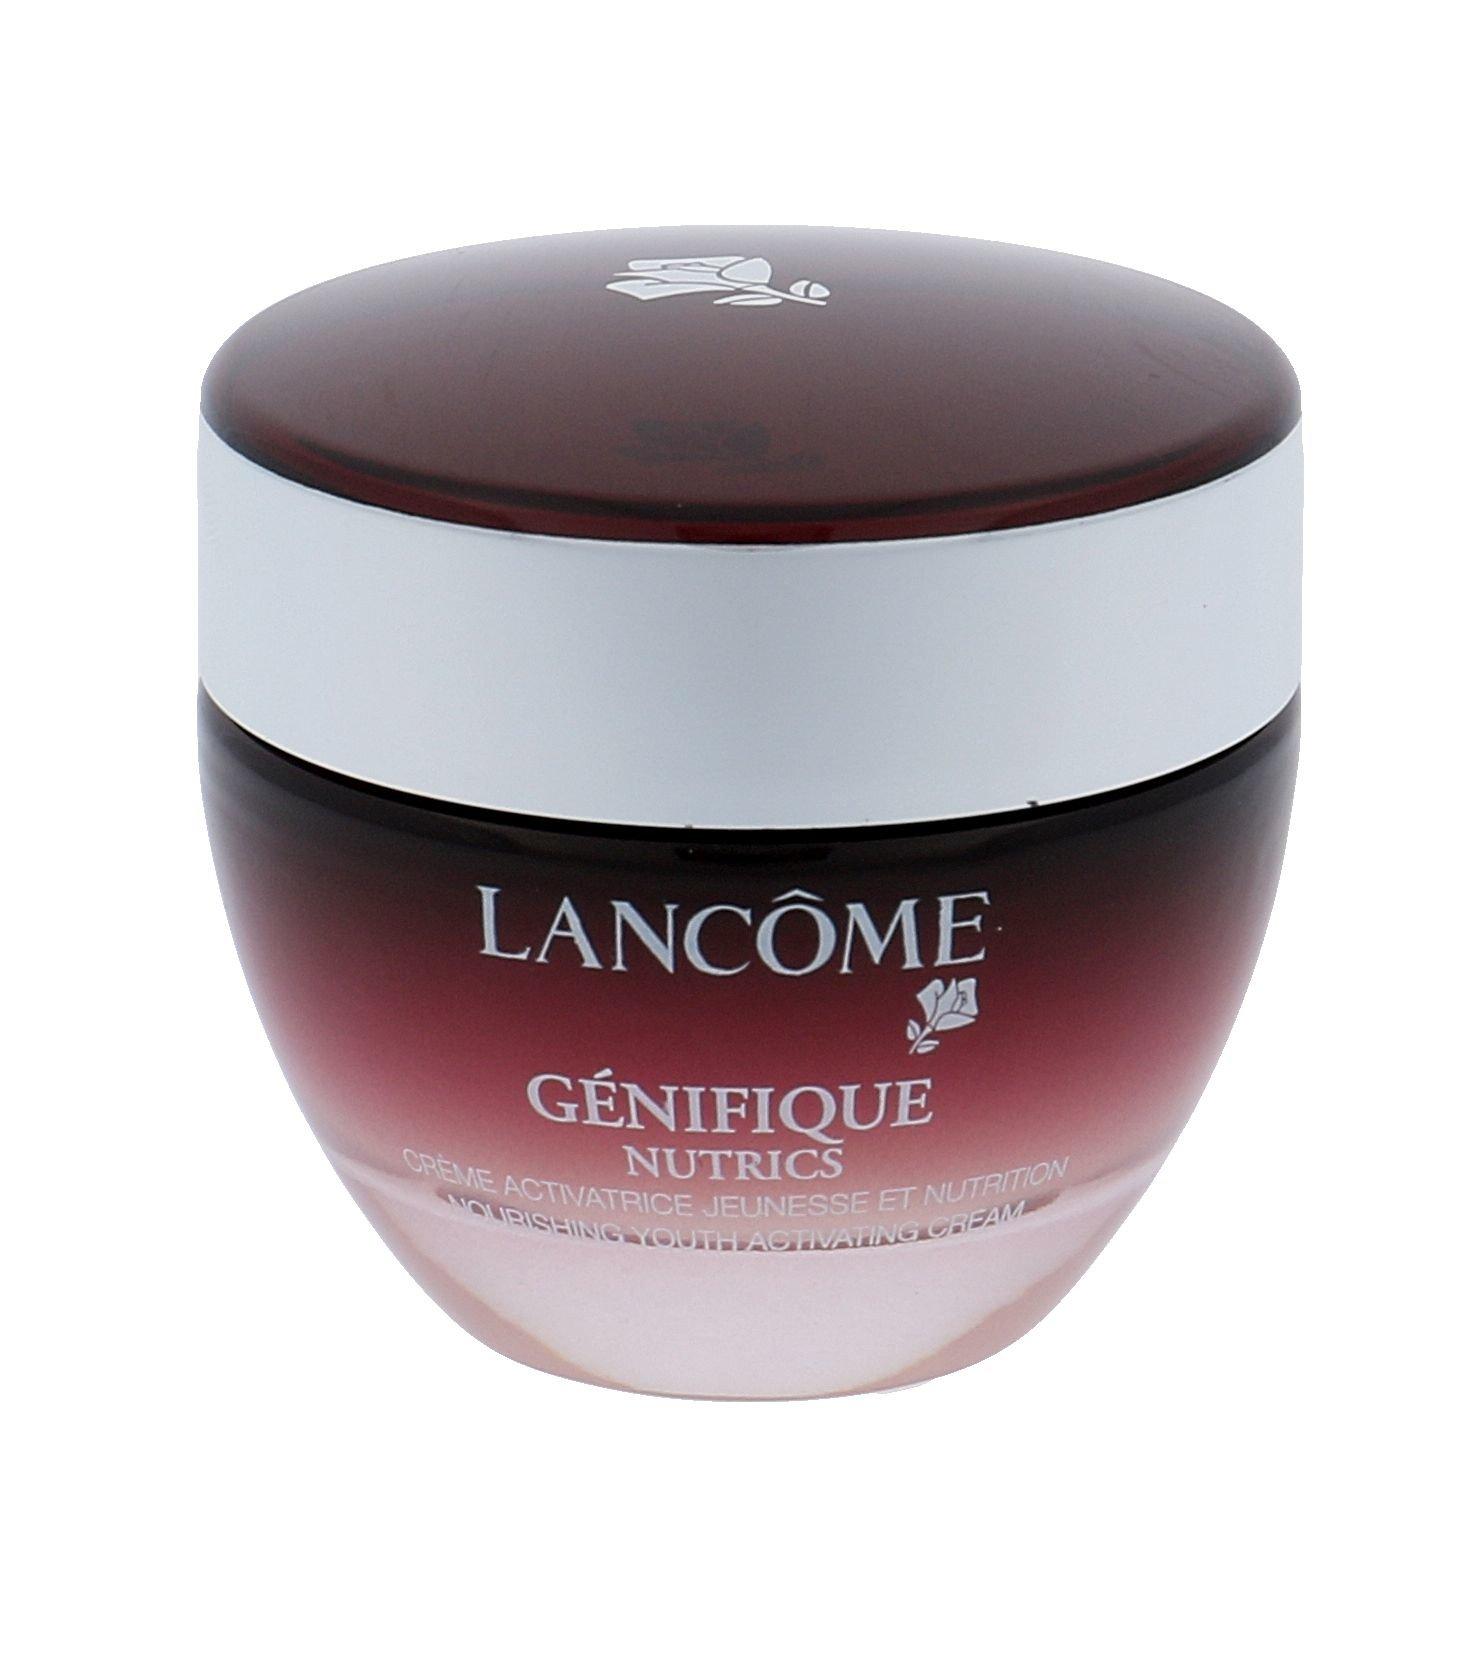 Lancôme Genifique Nutrics Day Cream 50ml